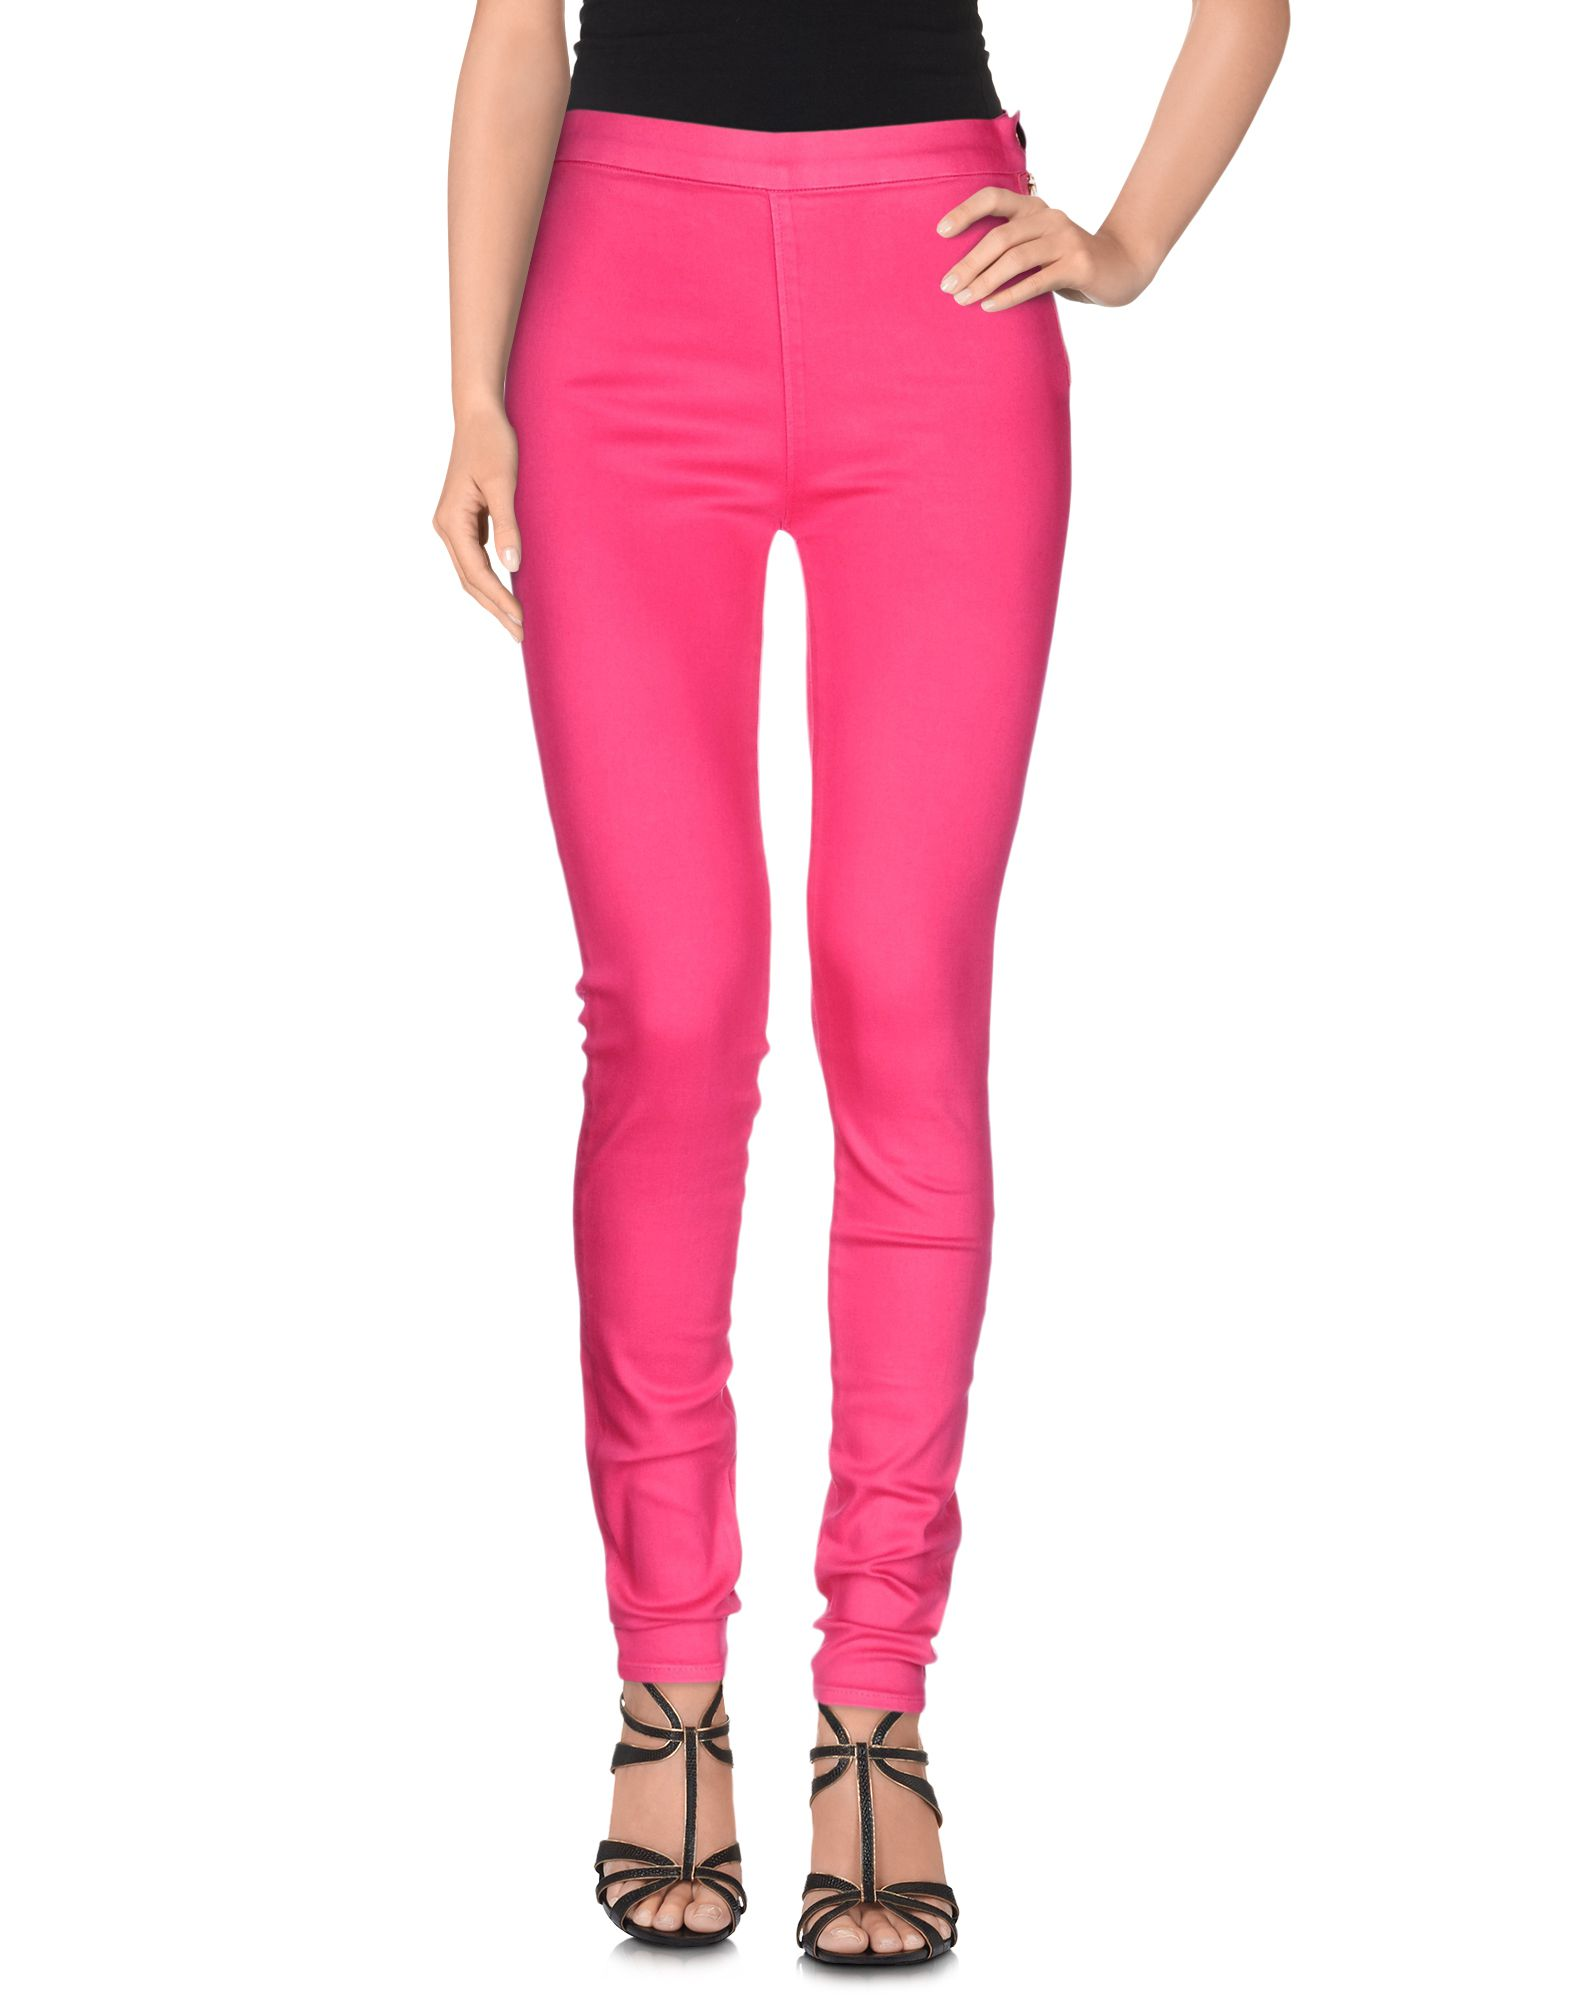 GIAMBATTISTA VALLI for 7 FOR ALL MANKIND Джинсовые брюки 7 for all mankind потертые джинсы